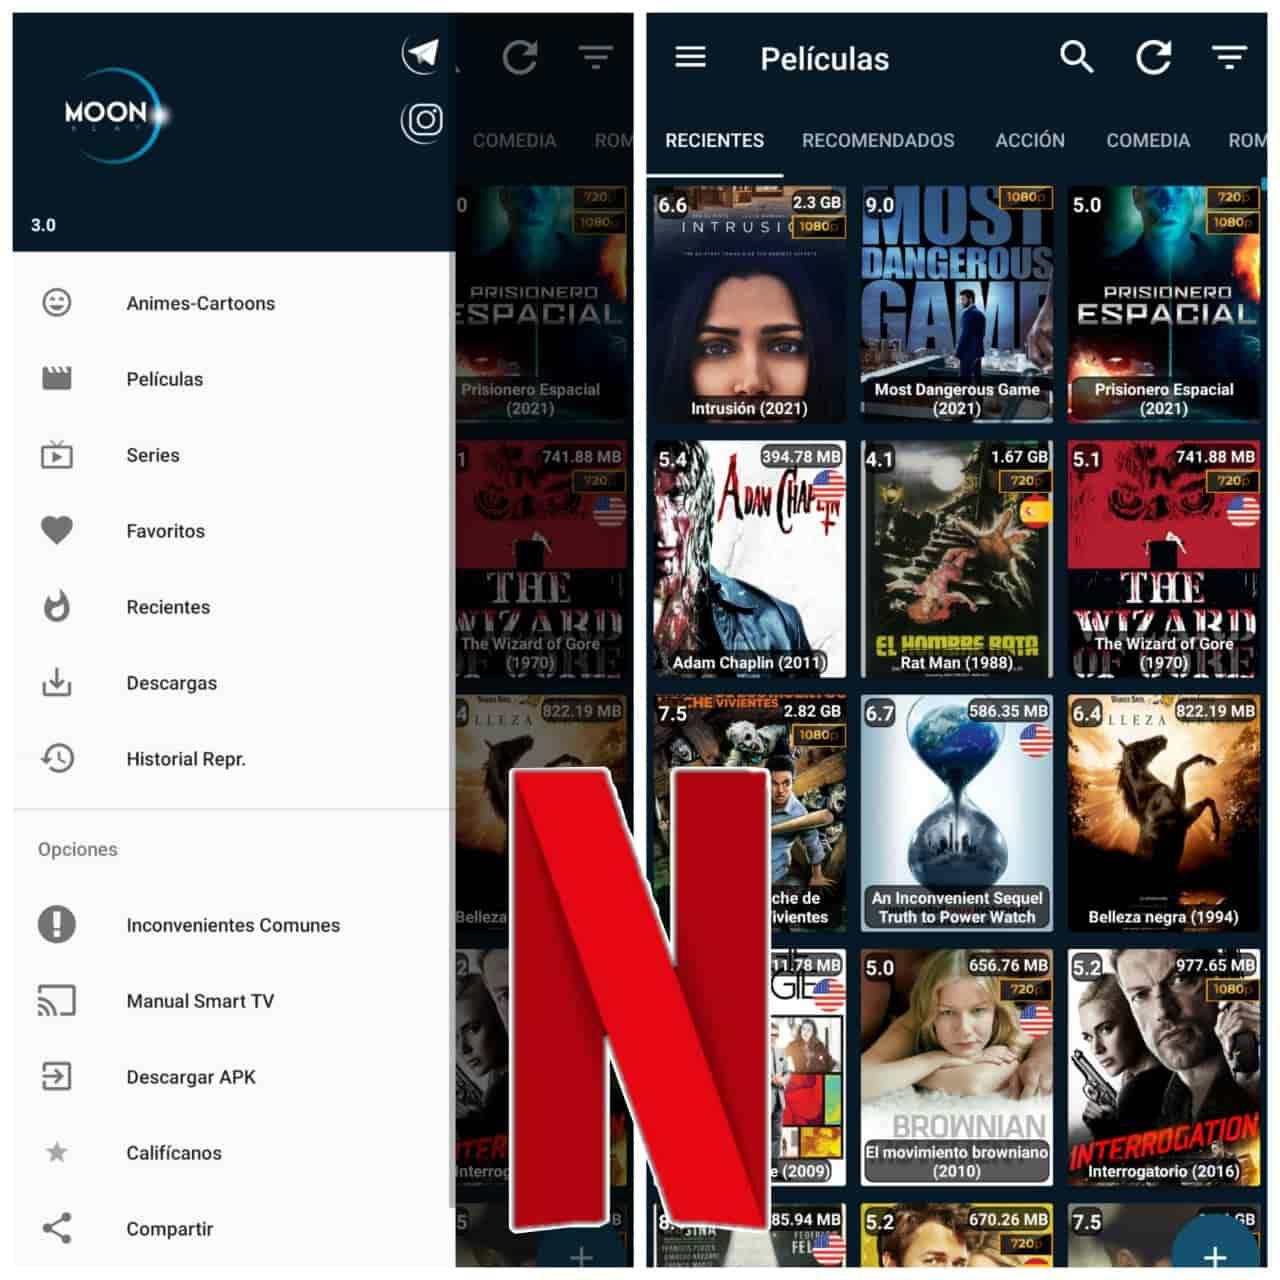 Moonklat APP Para Ver PELICULAS, SERIES, ANIMES Y TELENOVELAS En Android 2021